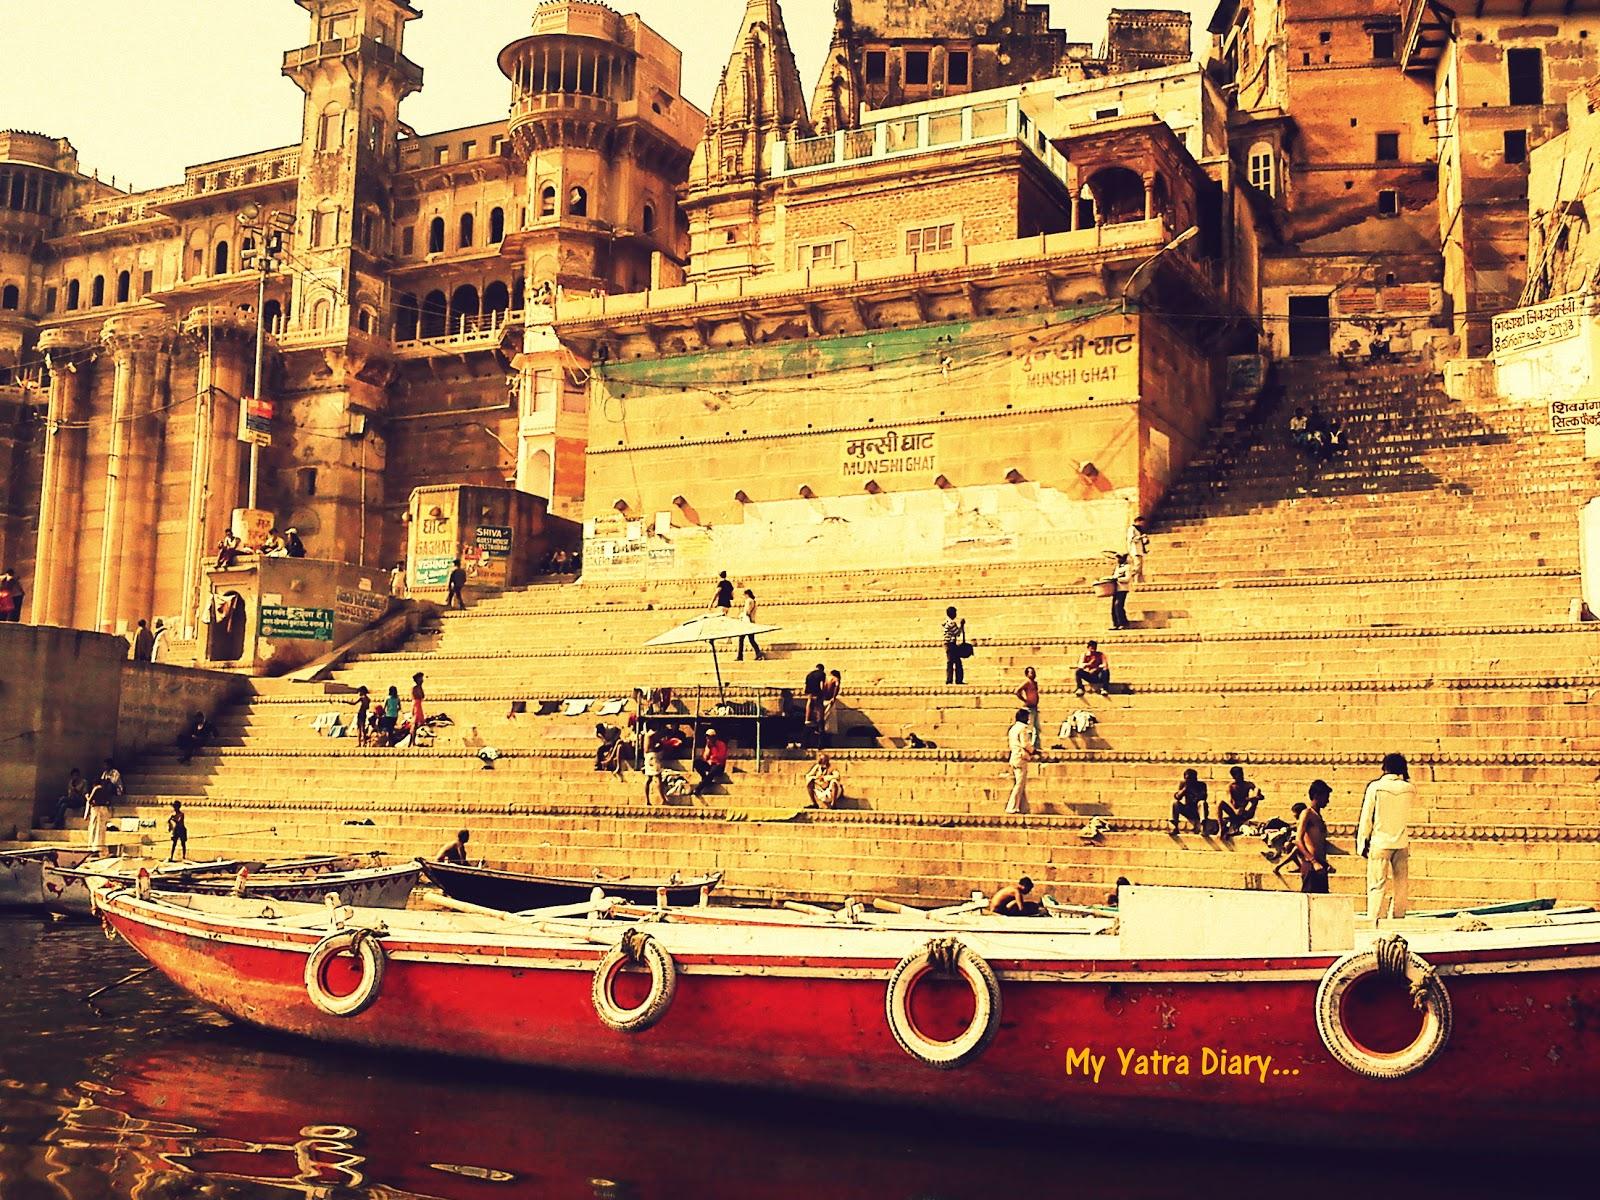 Munshi Ghat in Varanasi dedicated to Munshi Premchand.